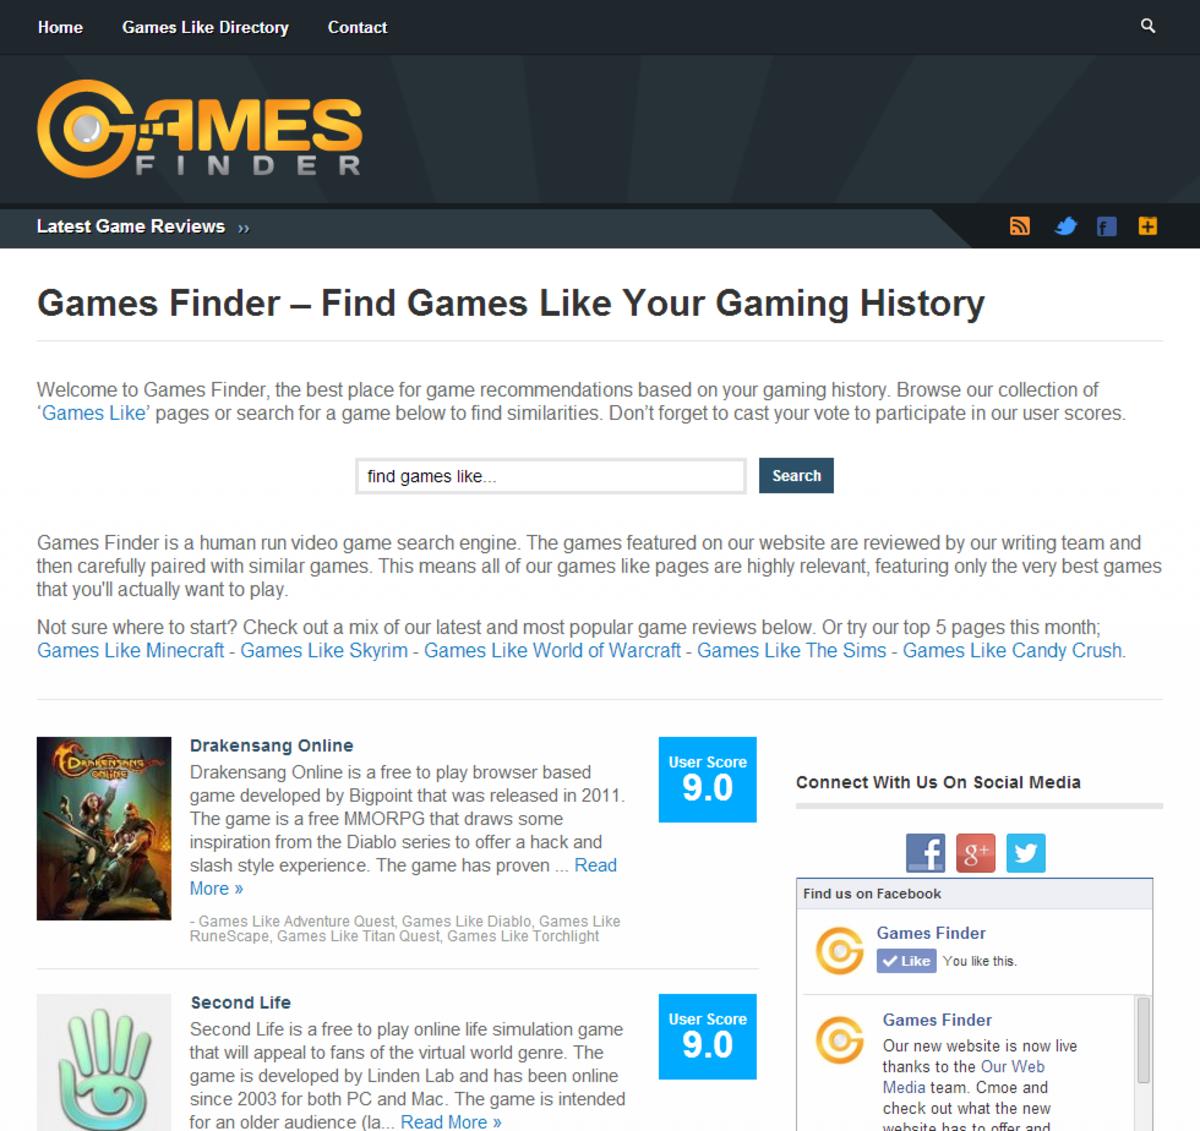 GamesFinder Home Page (March 2014)